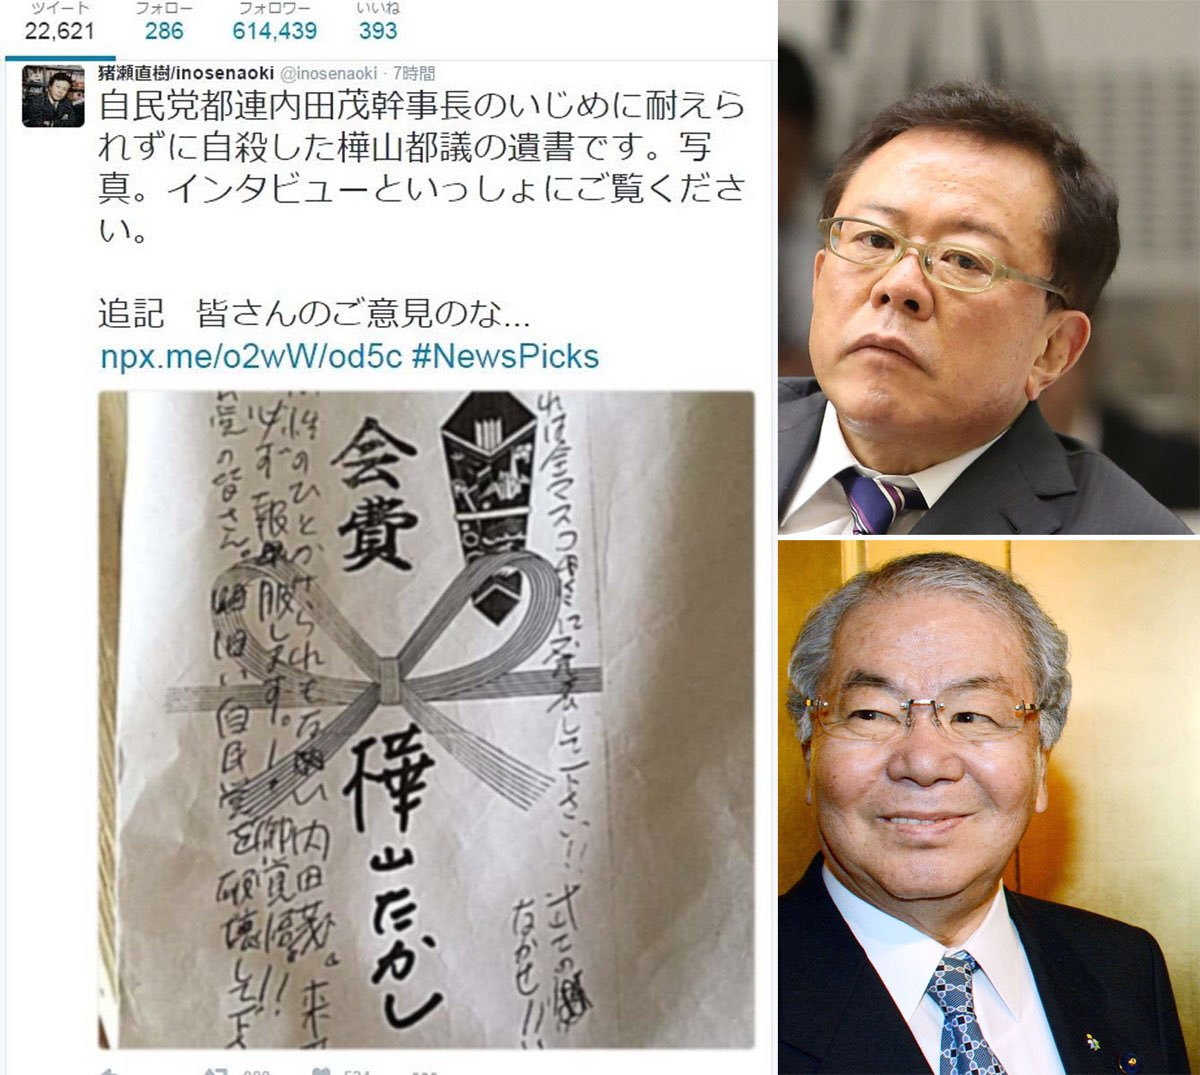 tweet : 都連の闇 都議会自民内...